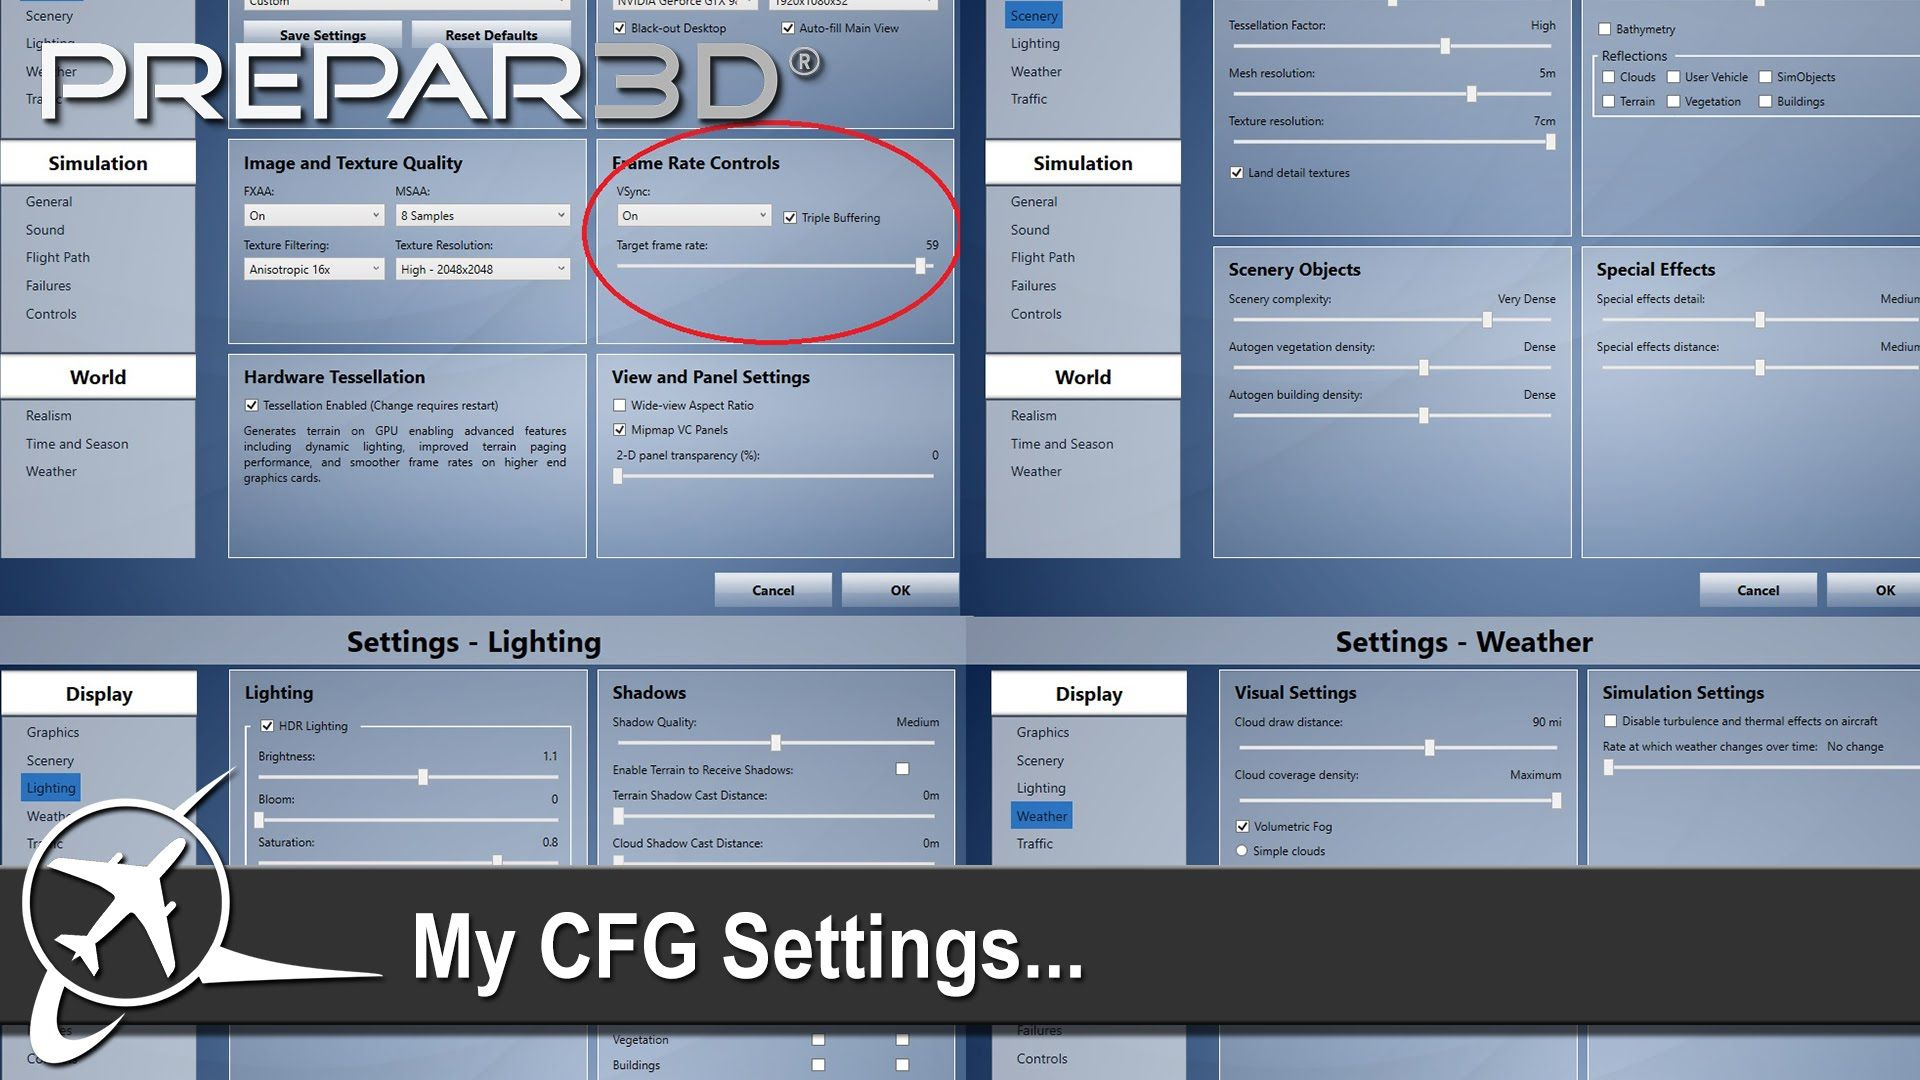 Prepar3D v3] My P3D CFG & Settings | Flight Sim | Desktop